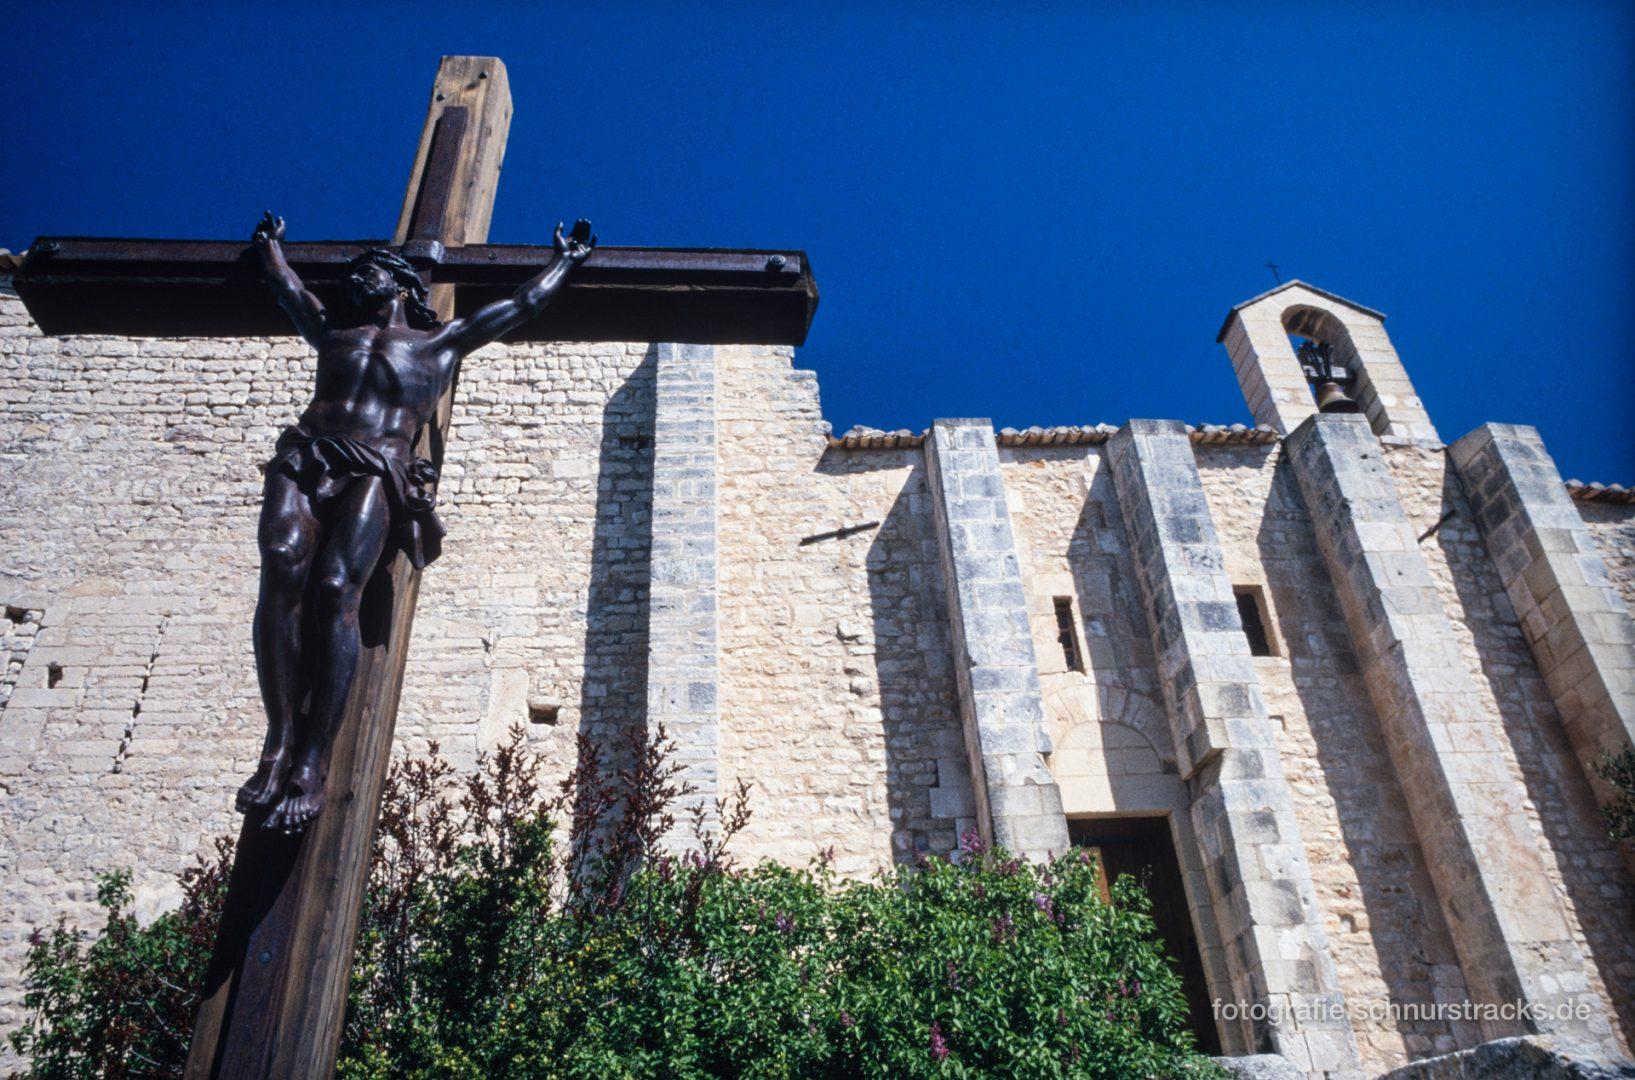 Provence - Saint-Saturnin-lès-Apt #0751